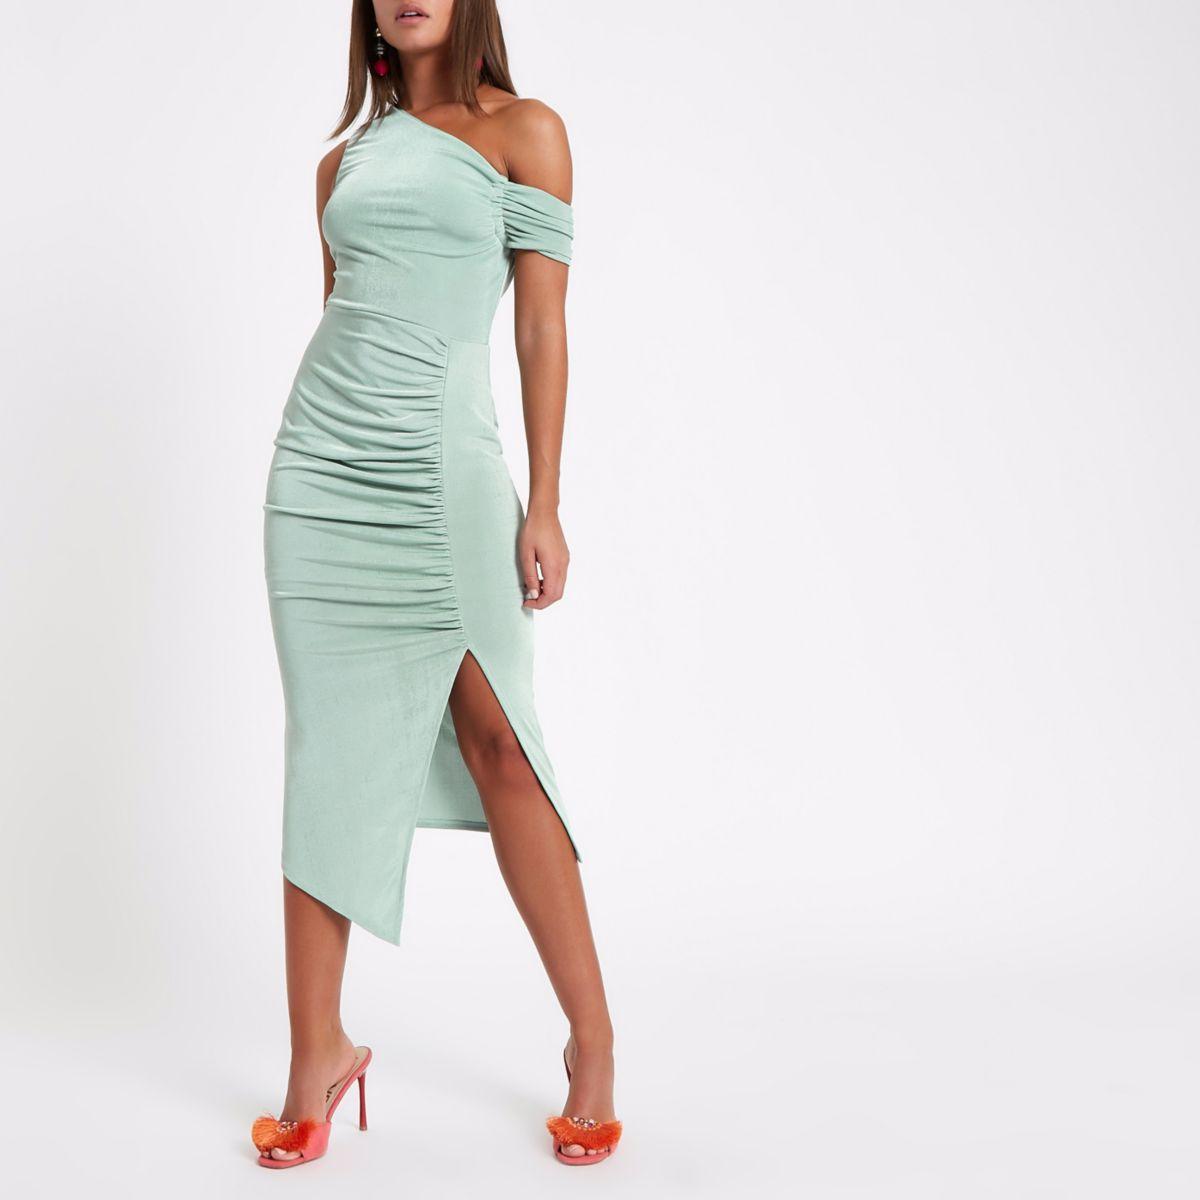 Green one shoulder ruched midi dress